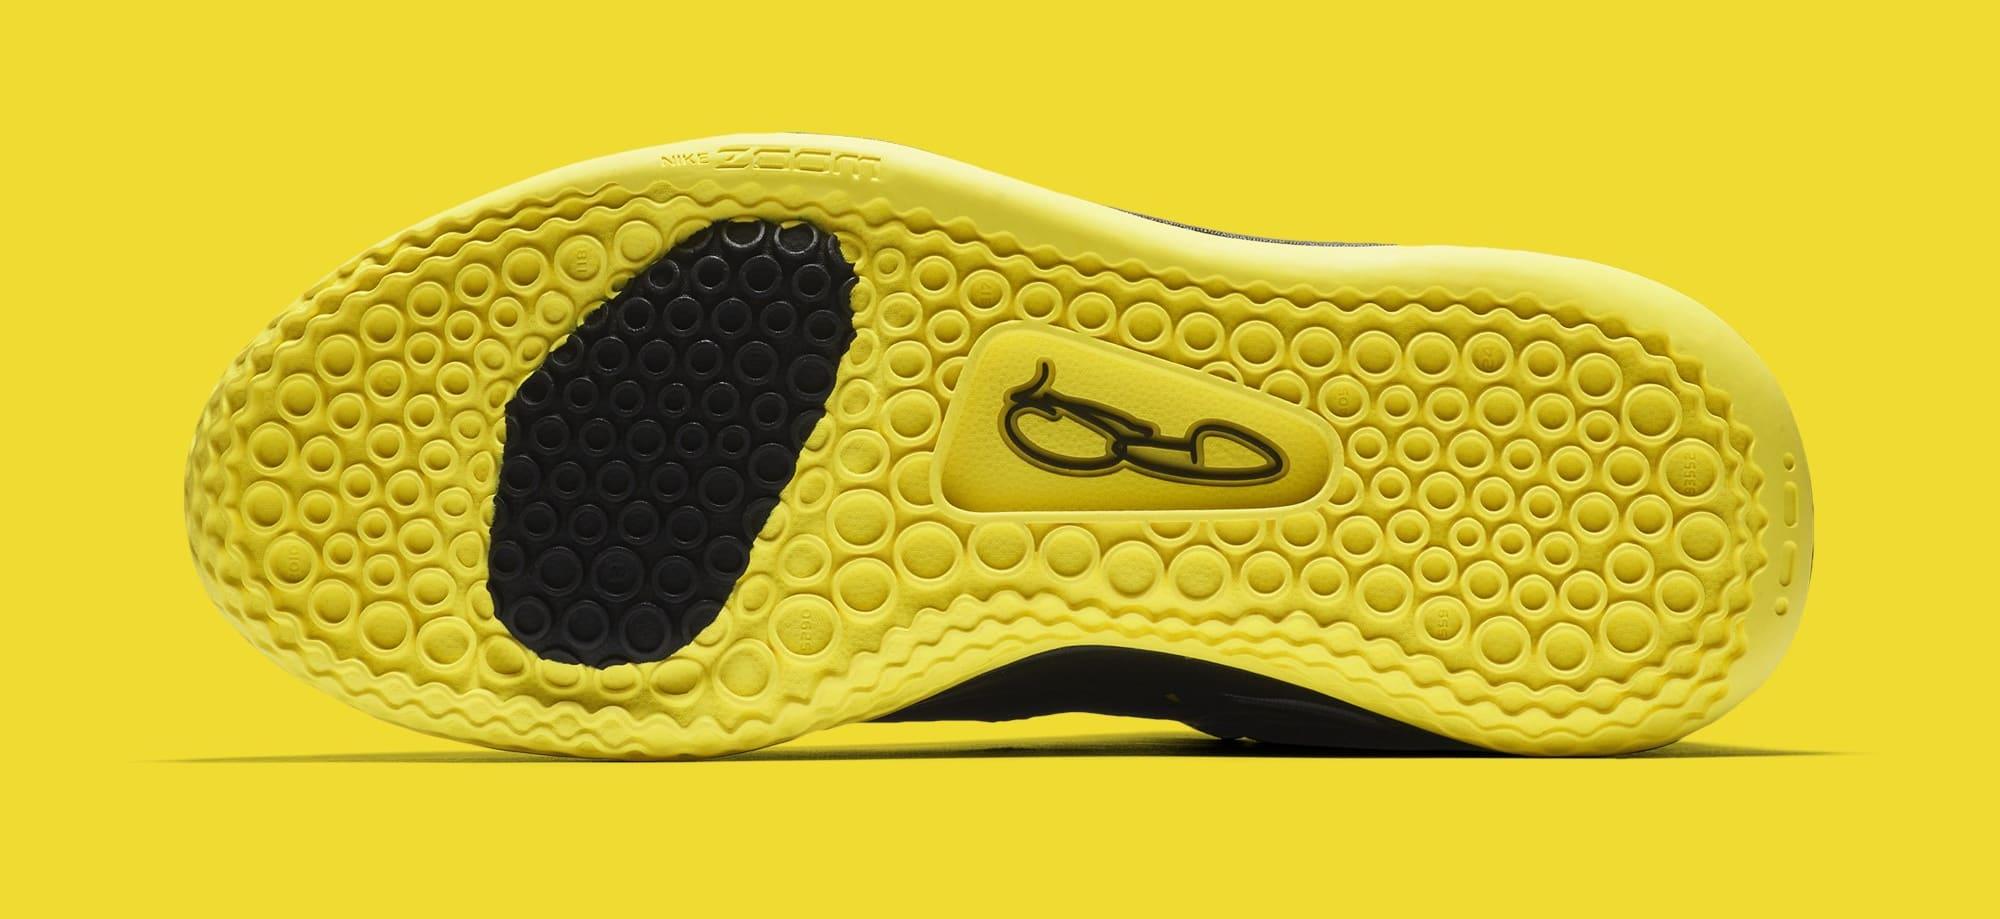 Nike PG 3 'Mamba Mentality' AO2608-900 (Bottom)